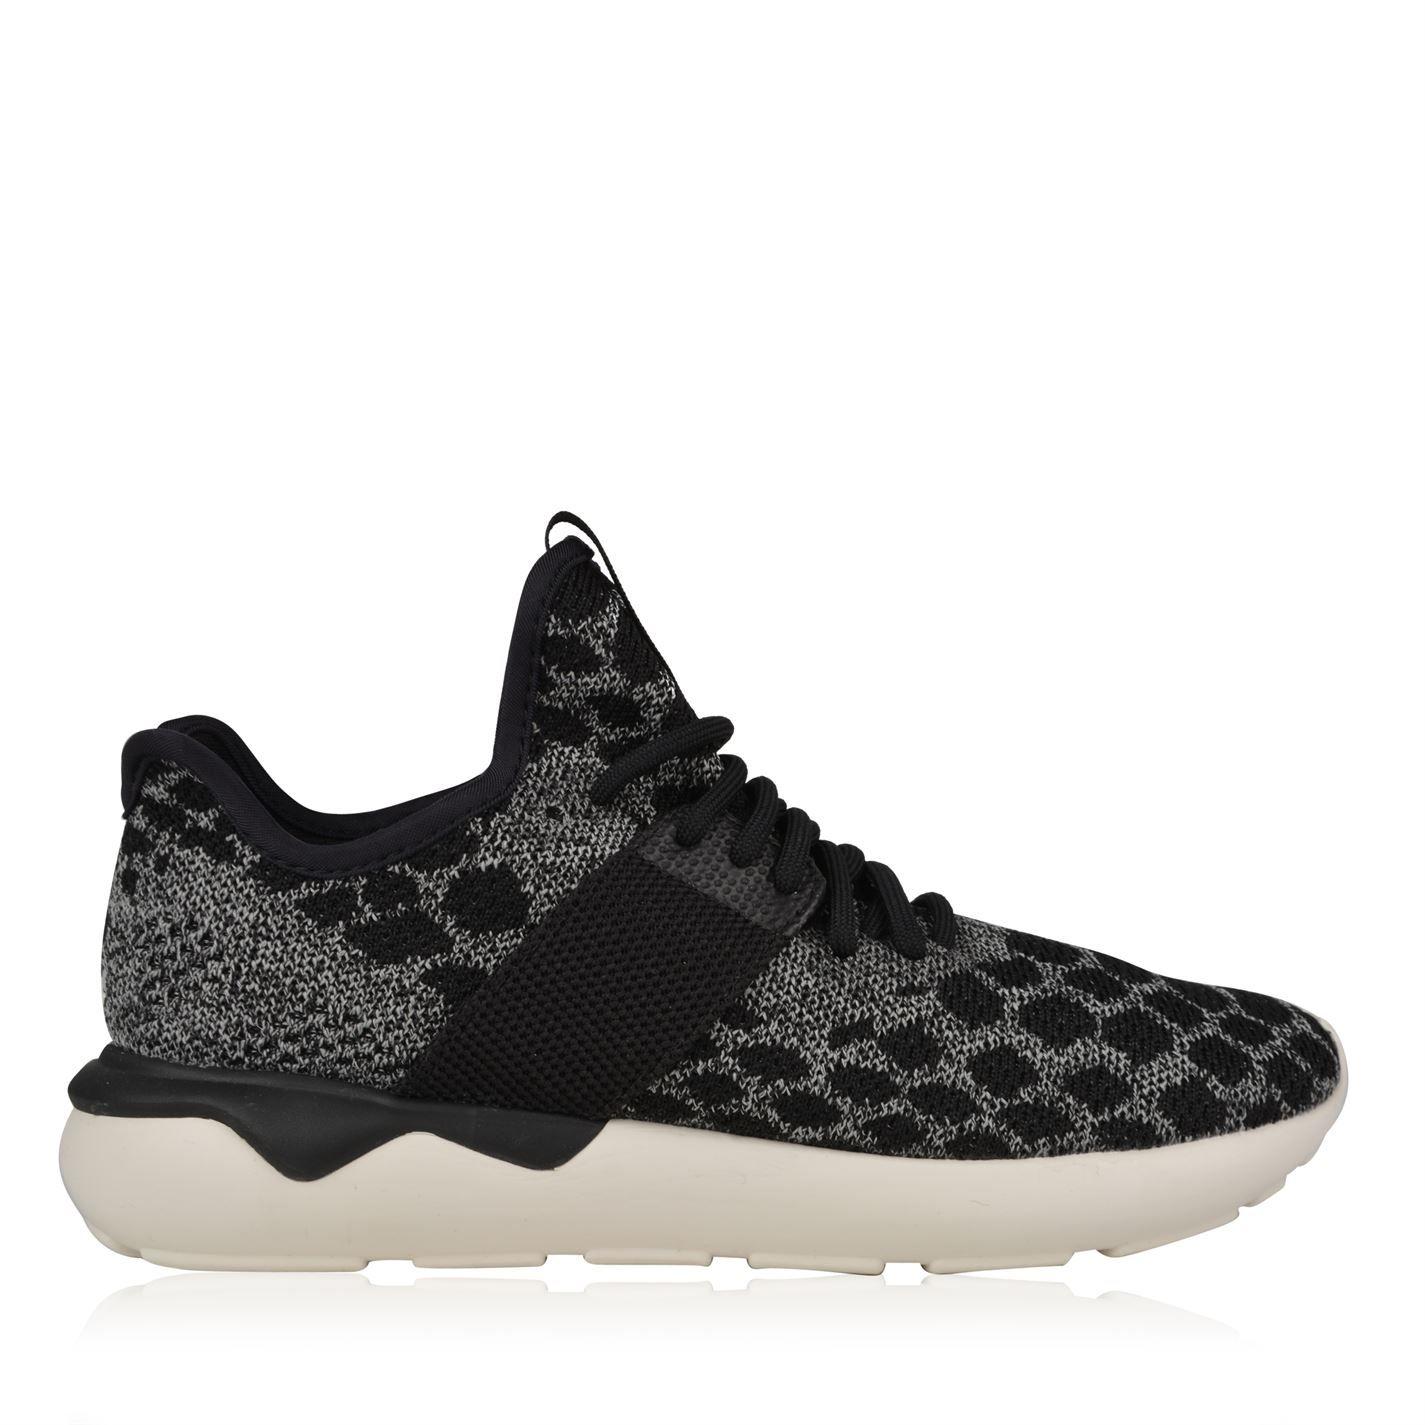 save off 7beb3 525f6 Adidas Originals   Tubular Runner Prime Knit Trainers · Tubular RunnerMen s  FootwearRunnersAdidas OriginalsKnits